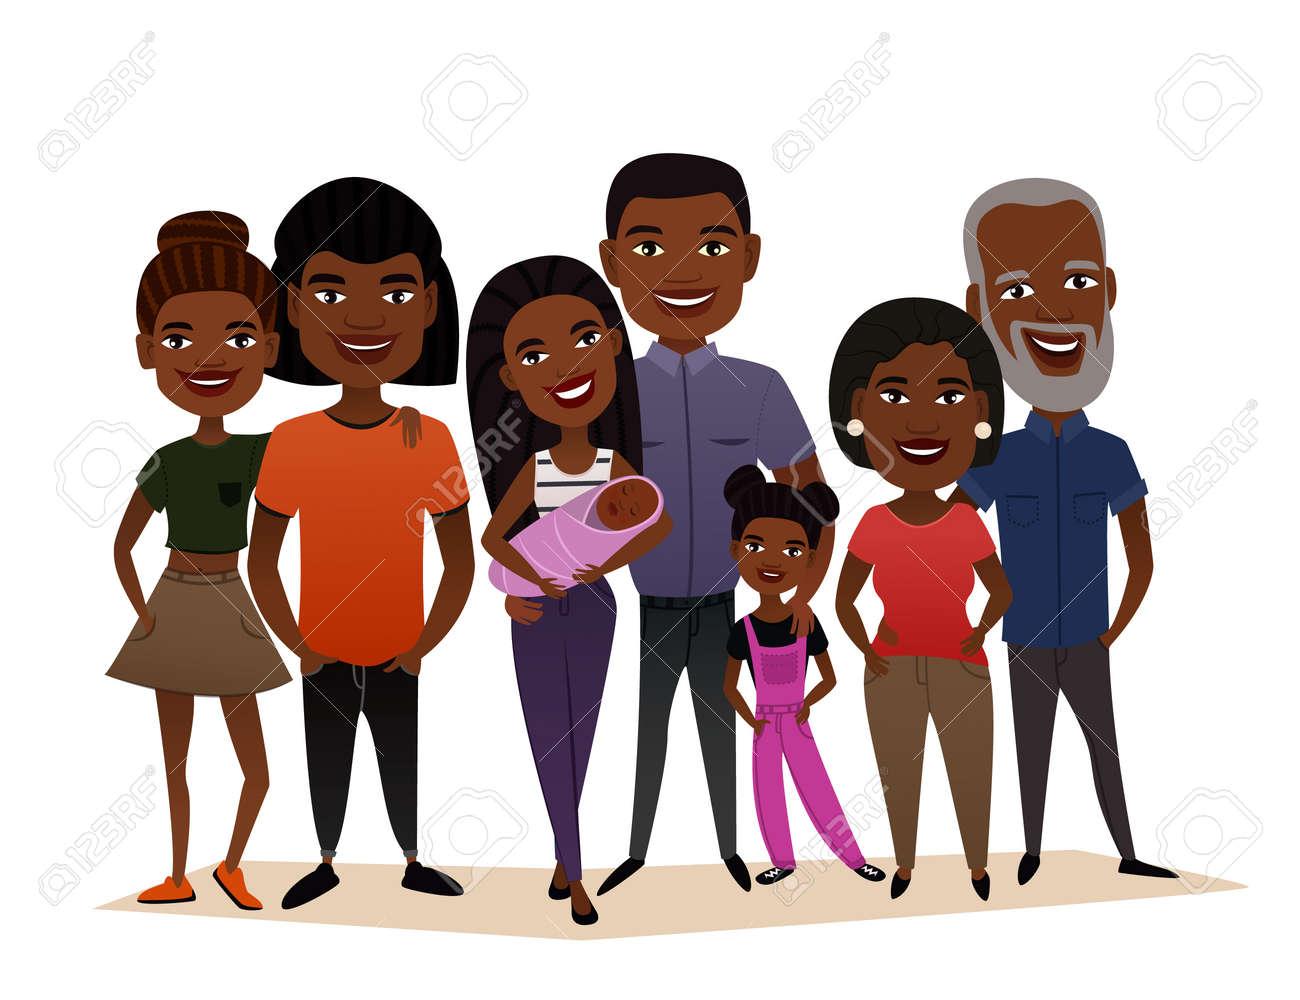 Big Happy Black Family Cartoon Concept Royalty Free Cliparts Vectors And Stock Illustration Image 69262119